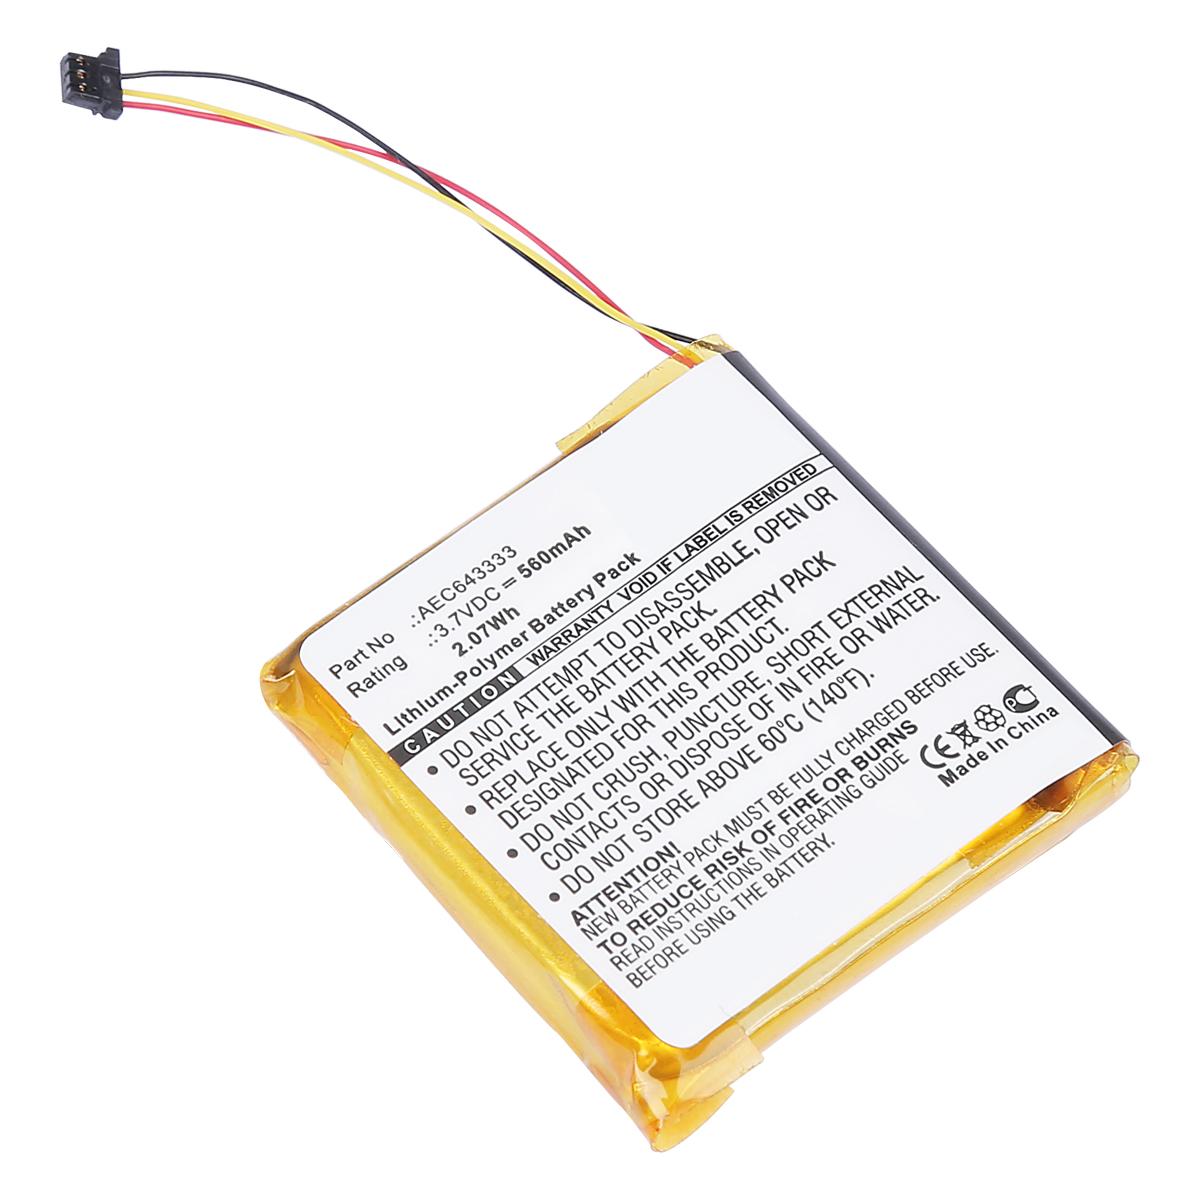 4a42aa8604c Battery for Beats Studio 2.0 , AEC643333 Wireless Headset 560mAh | eBay